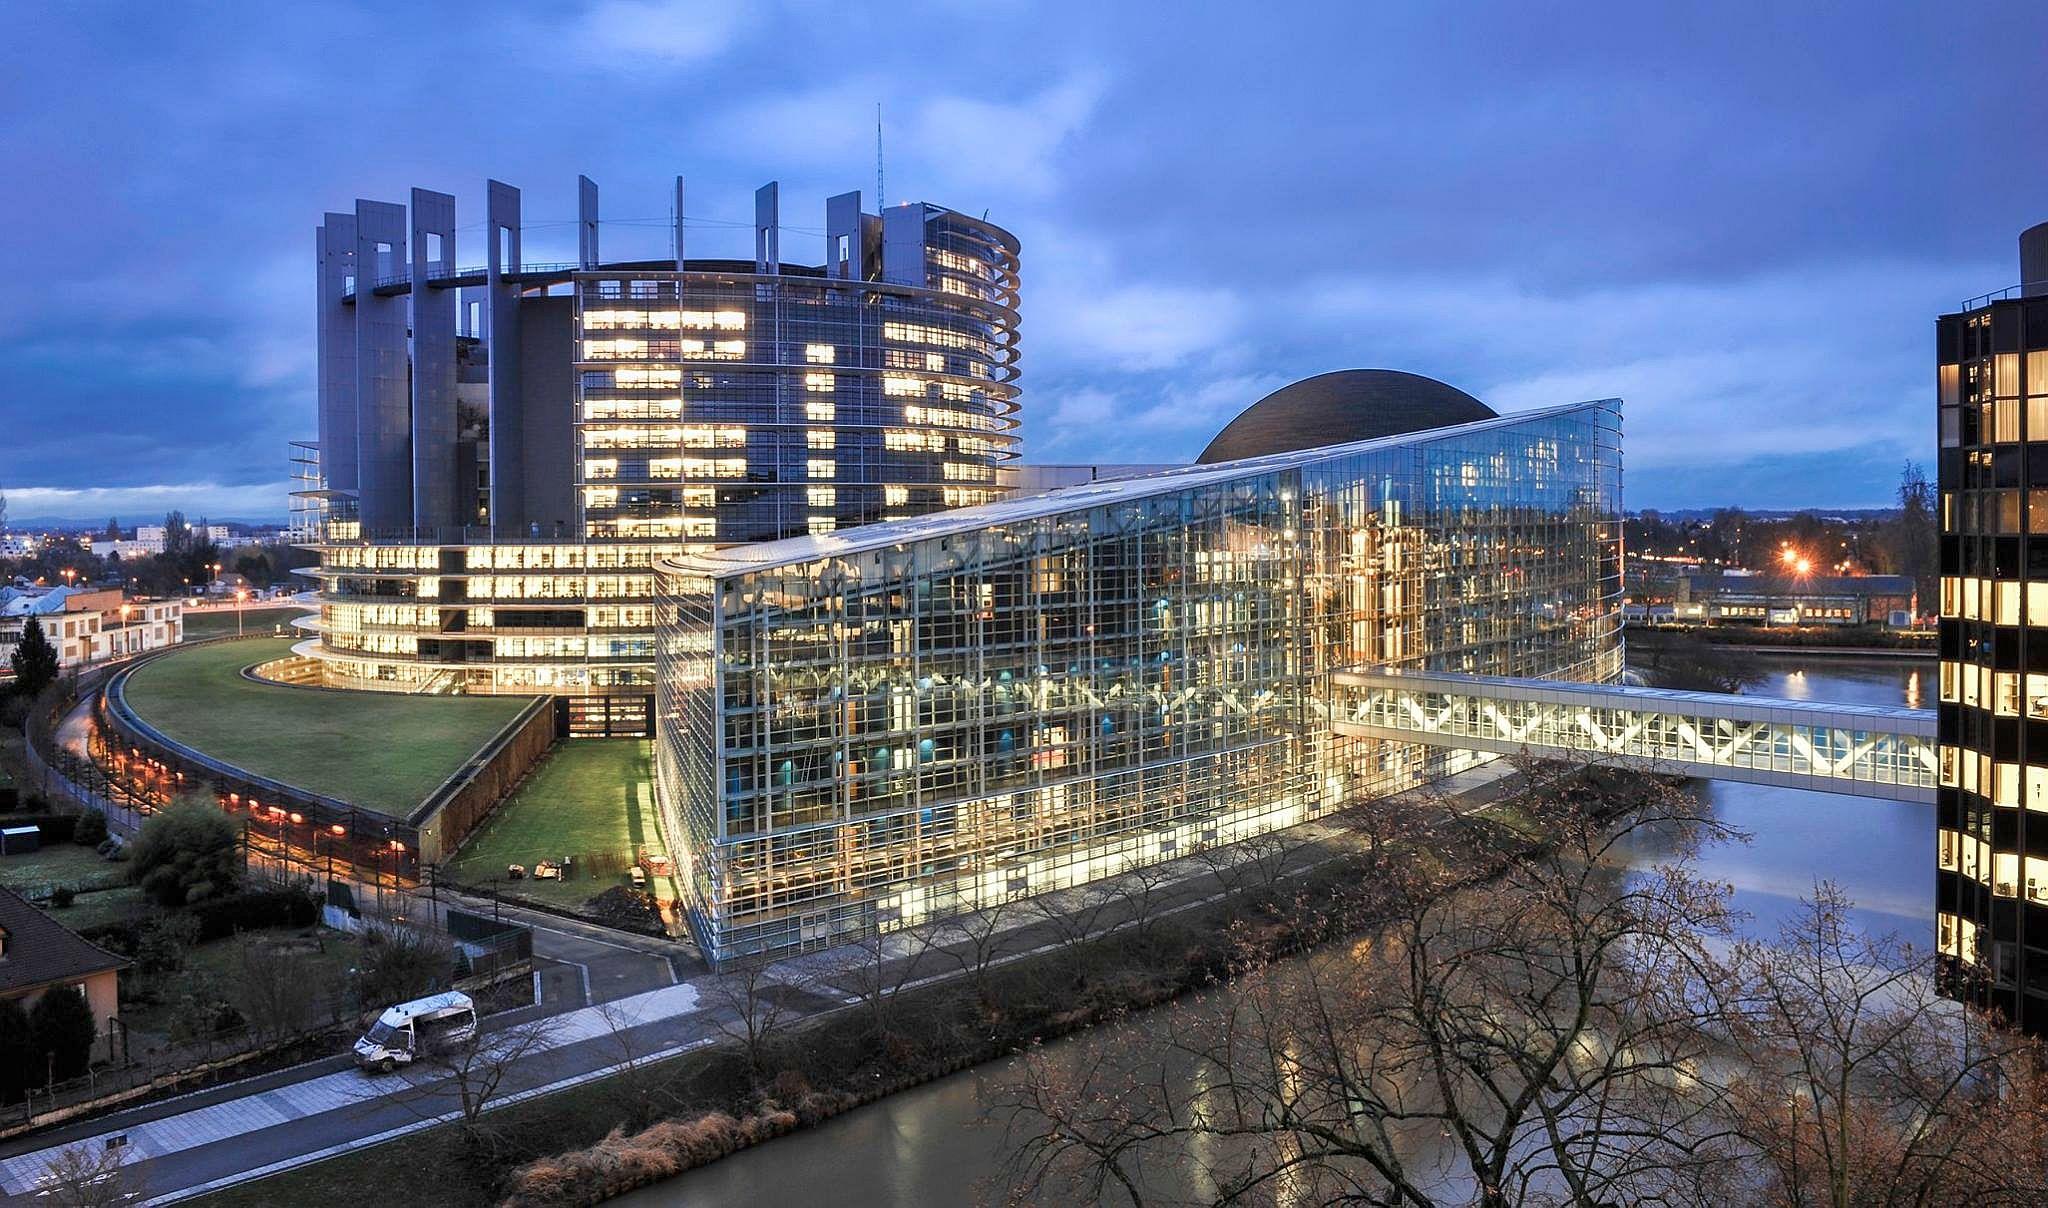 parlamentul european europarl.europa.eu